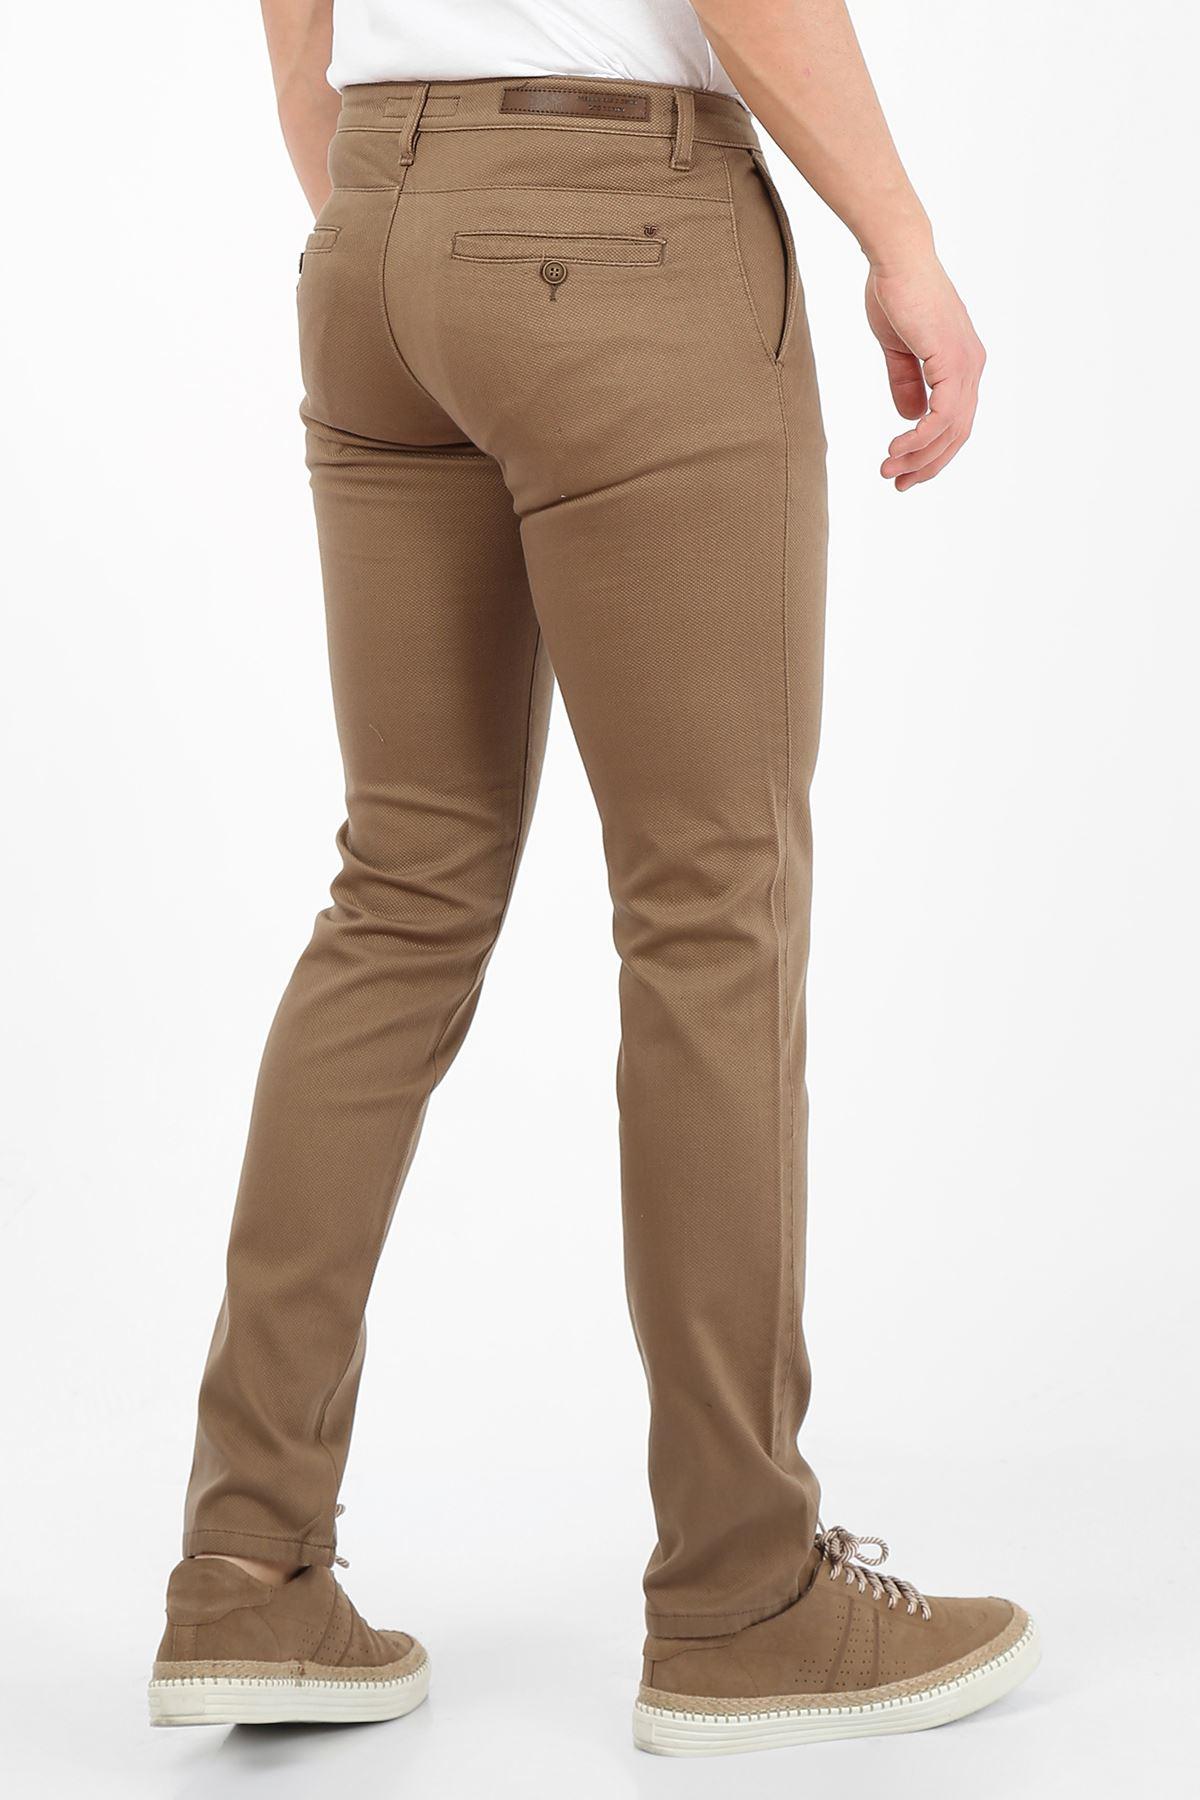 Camel Slim Fit Erkek Chino Pantolon -OLİVER